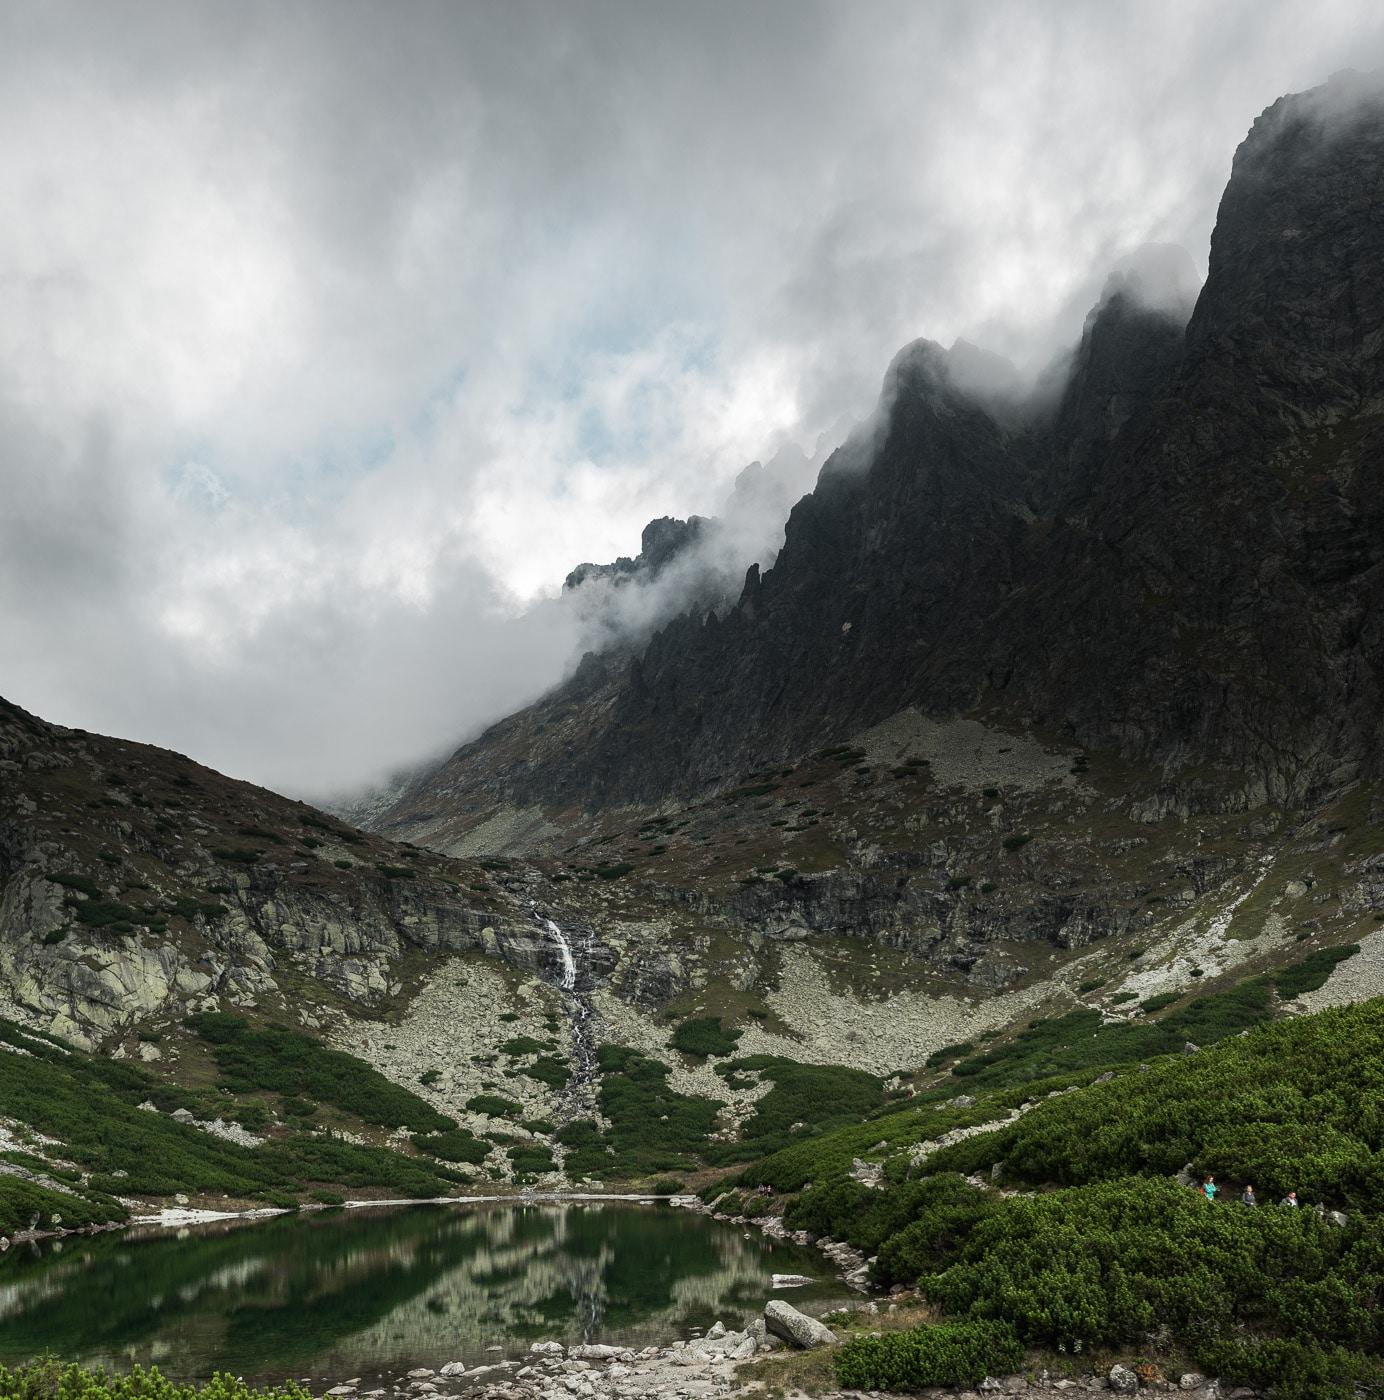 Velicke pleso under a cloudy sky